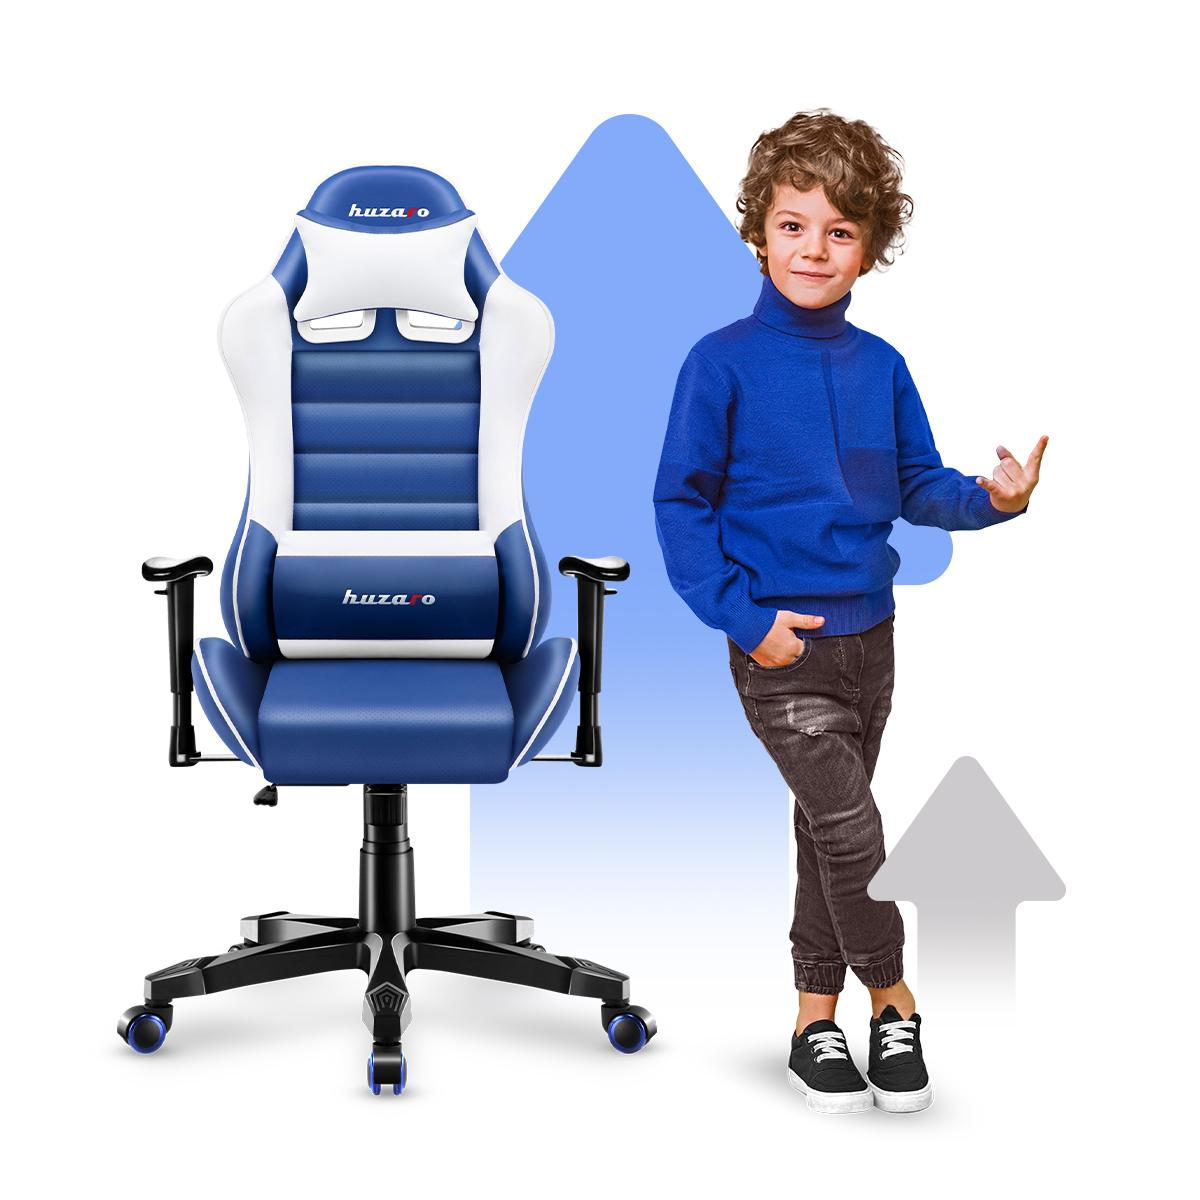 Fotel Ranger 6.0 Blue z dzieckiem